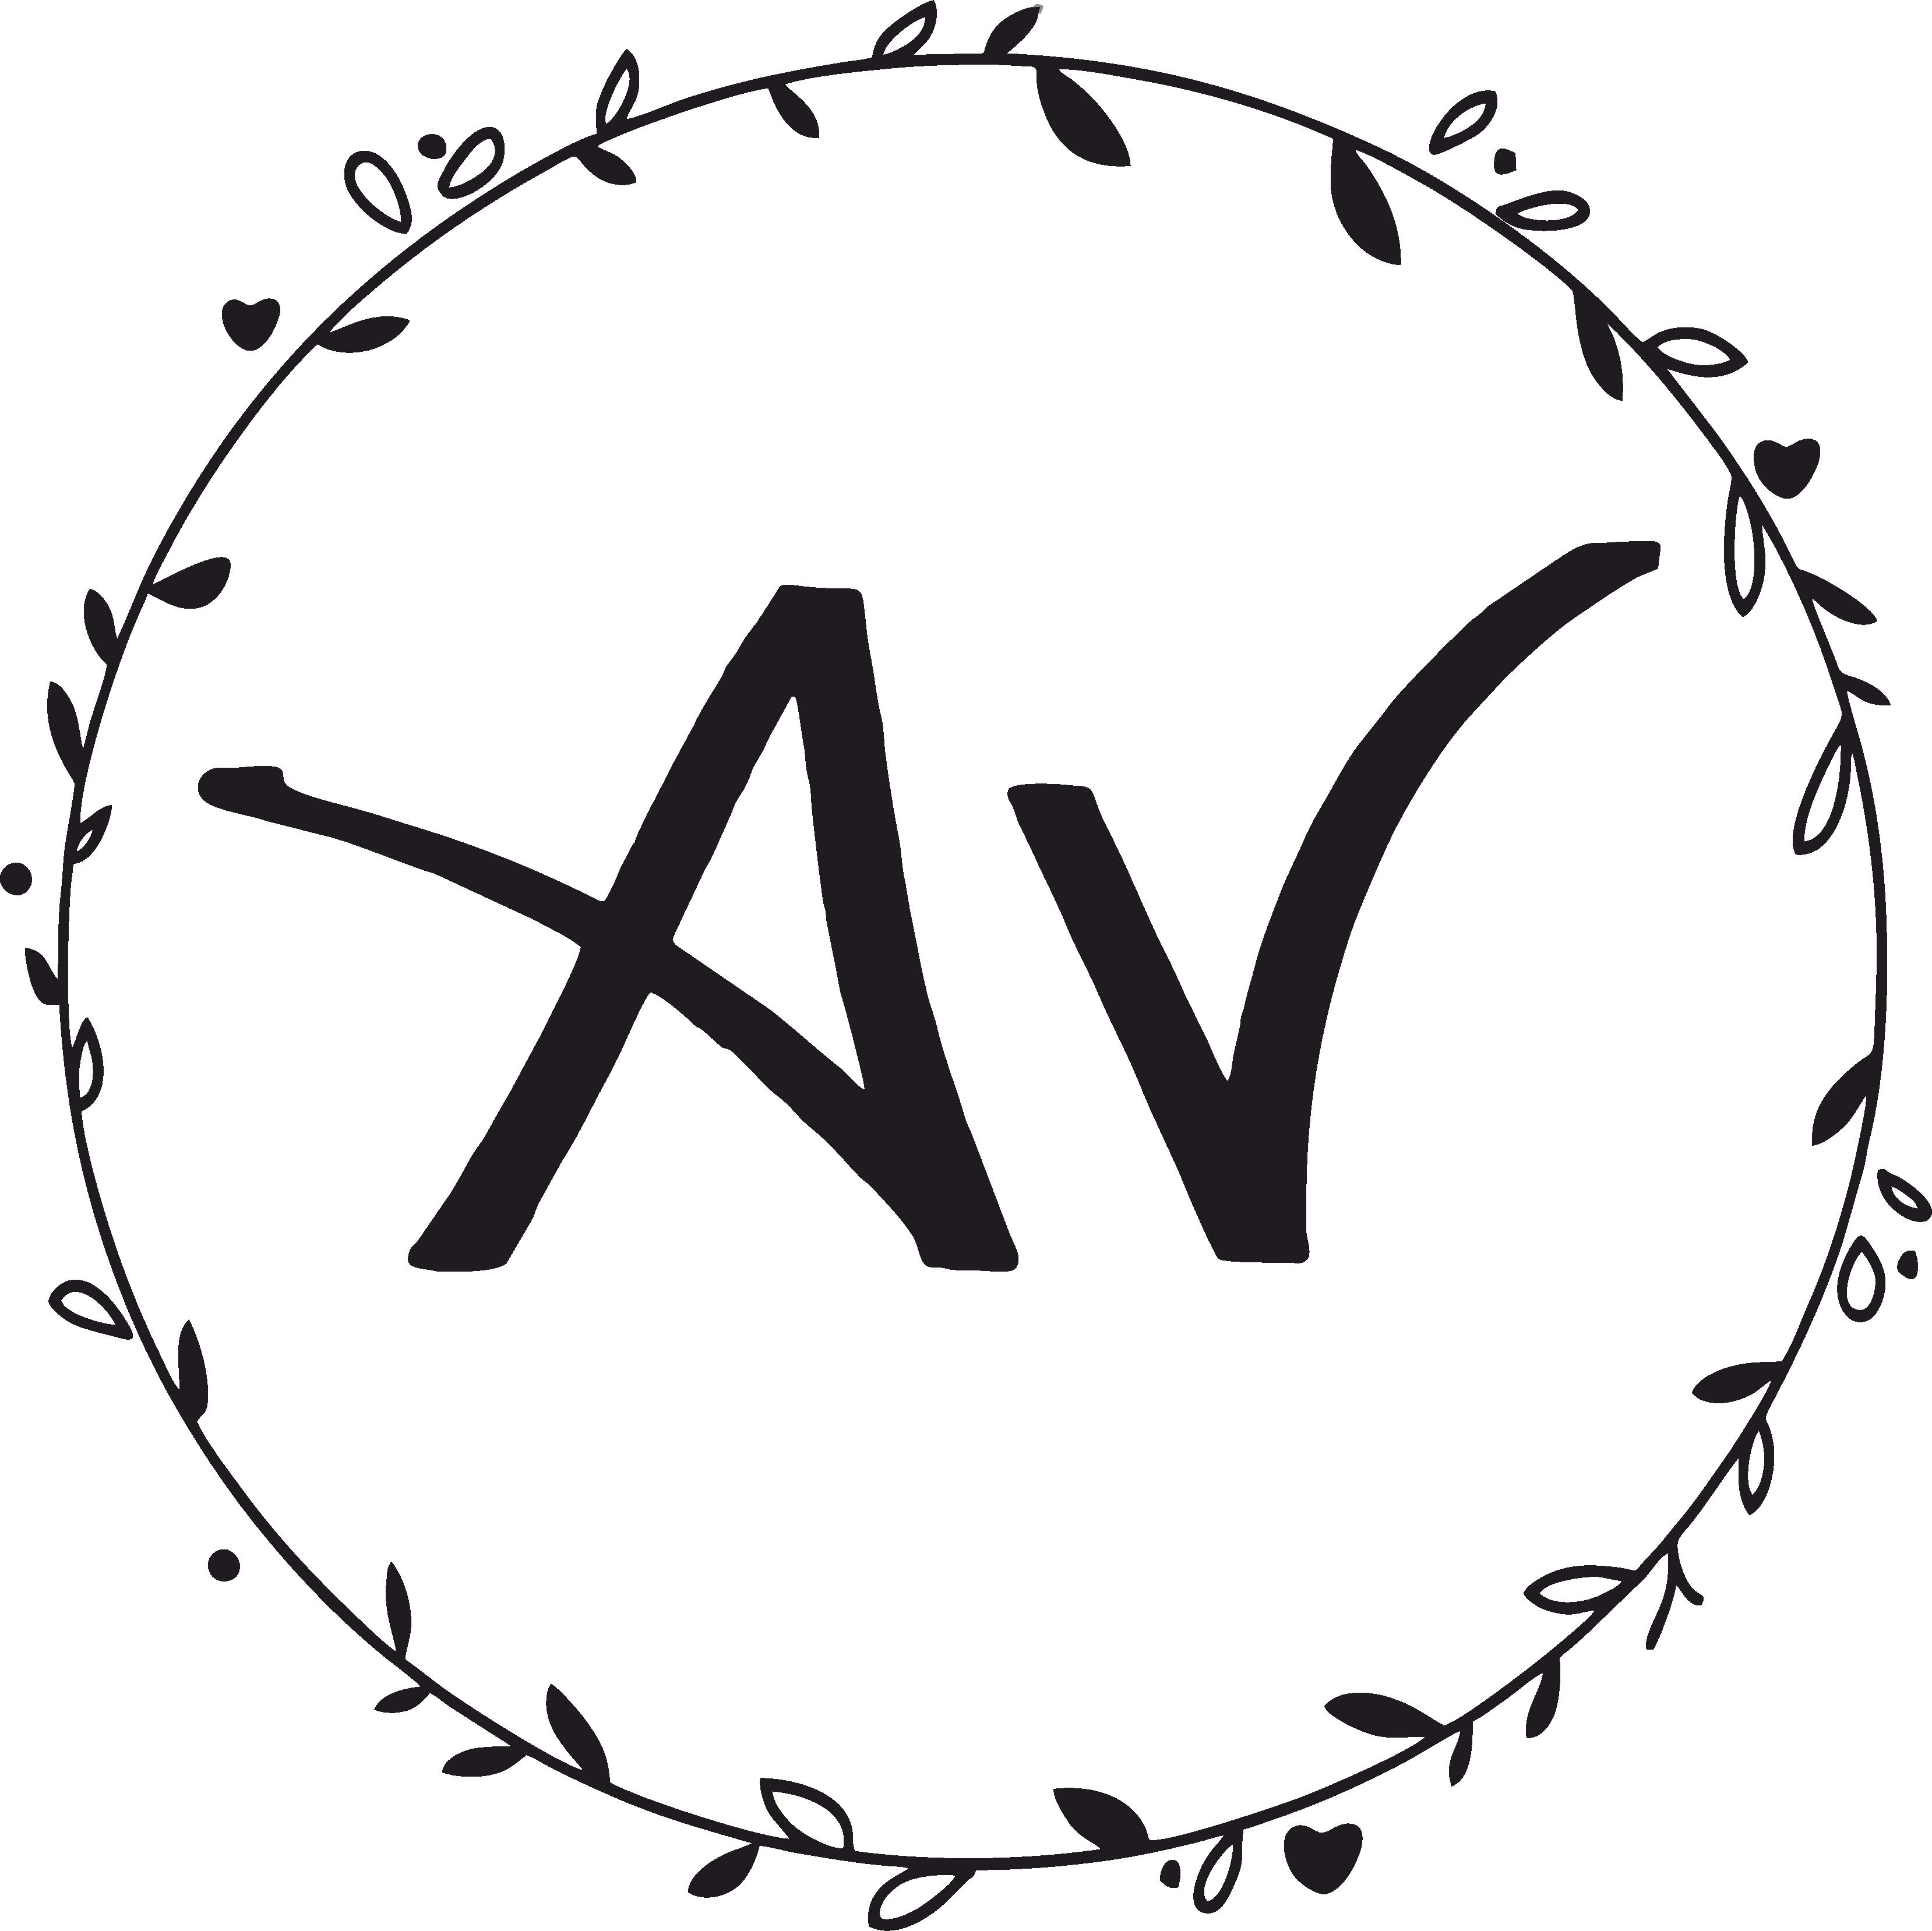 AV - AcessoriosVille®